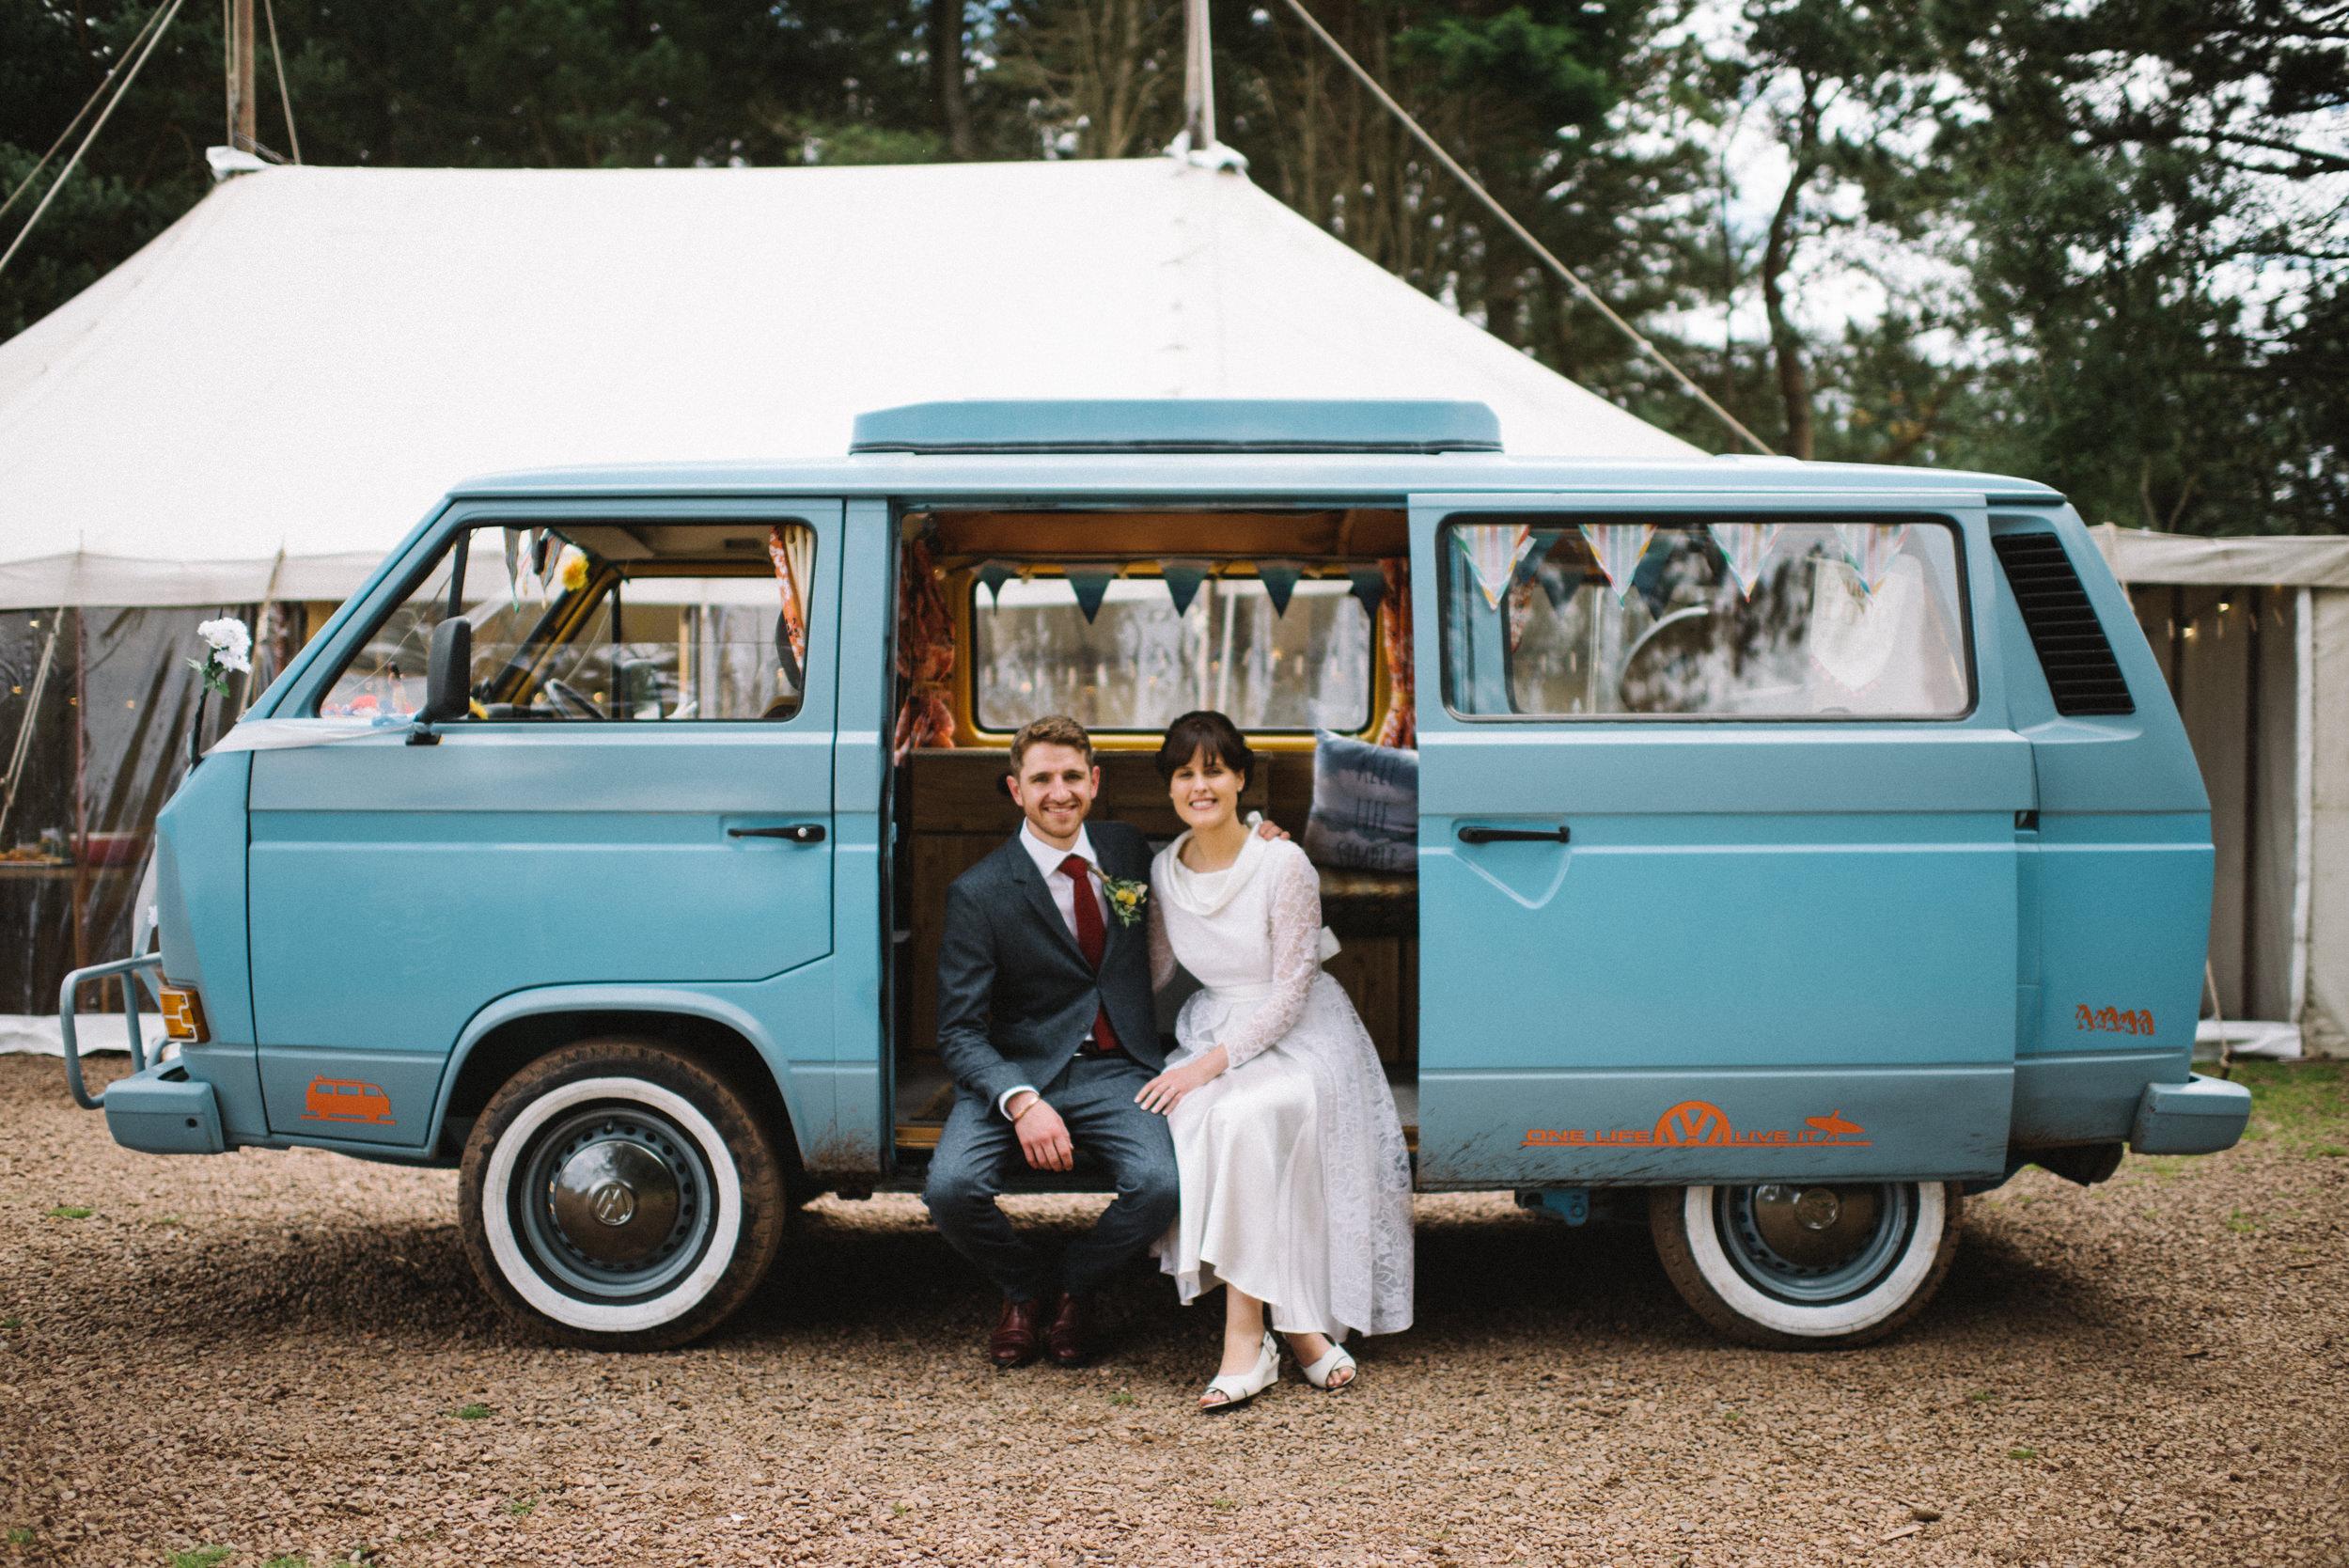 0130-alternative-wedding-portrait-family-kids-photographer-glasgow-scotland.JPG